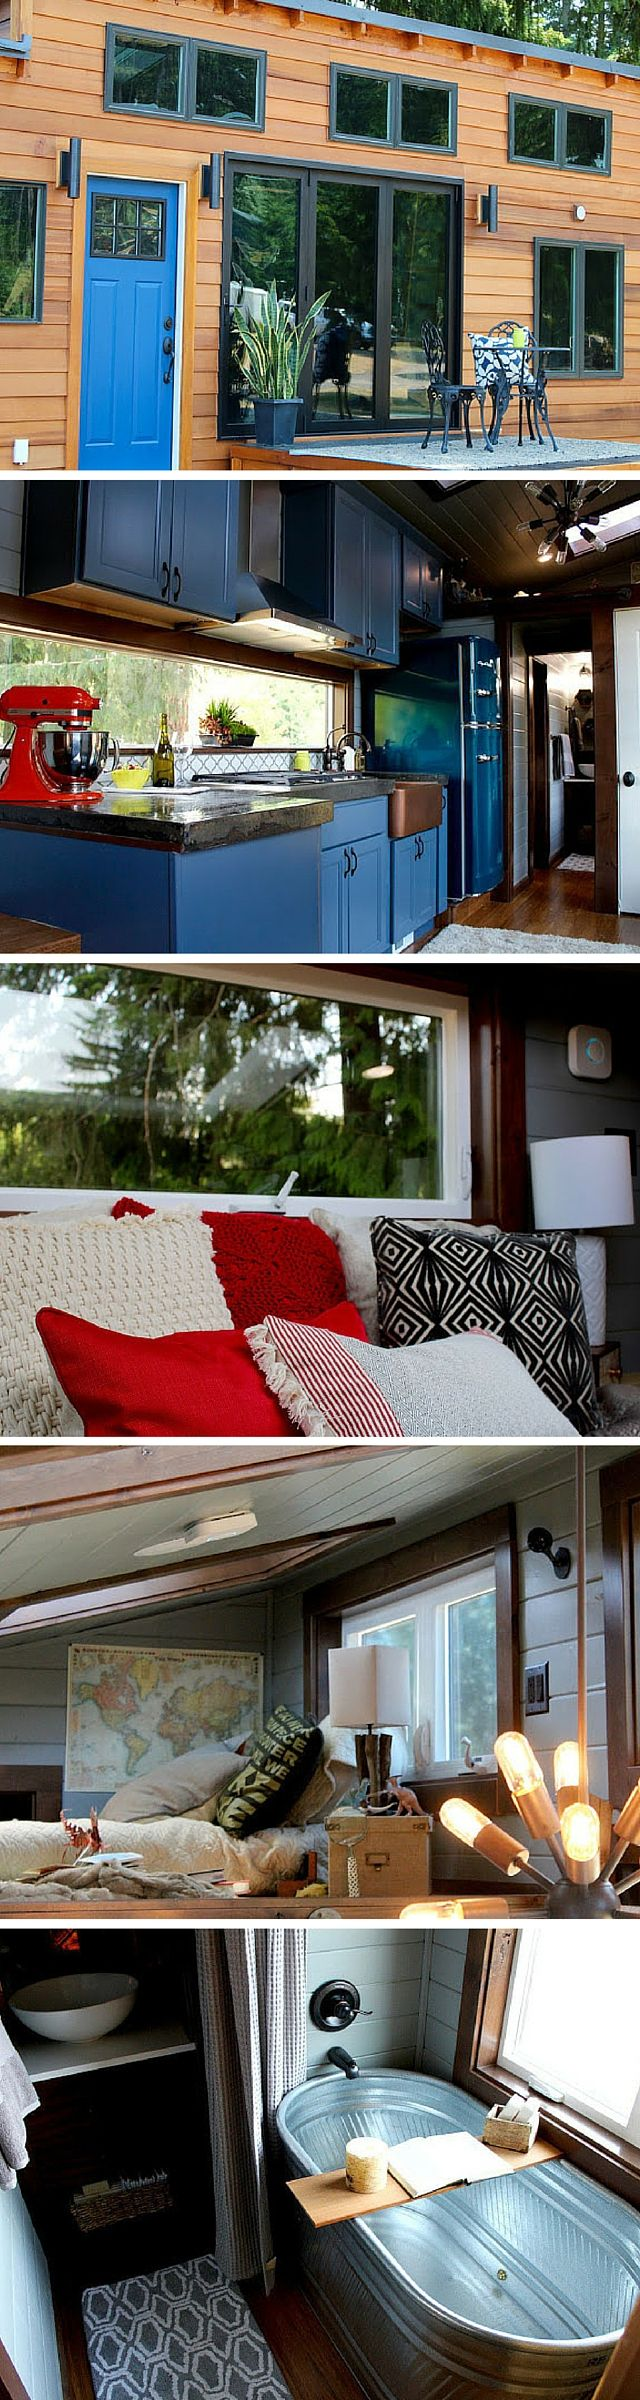 Bathroom Sinks Portland Oregon best 25+ map of portland oregon ideas on pinterest | portland